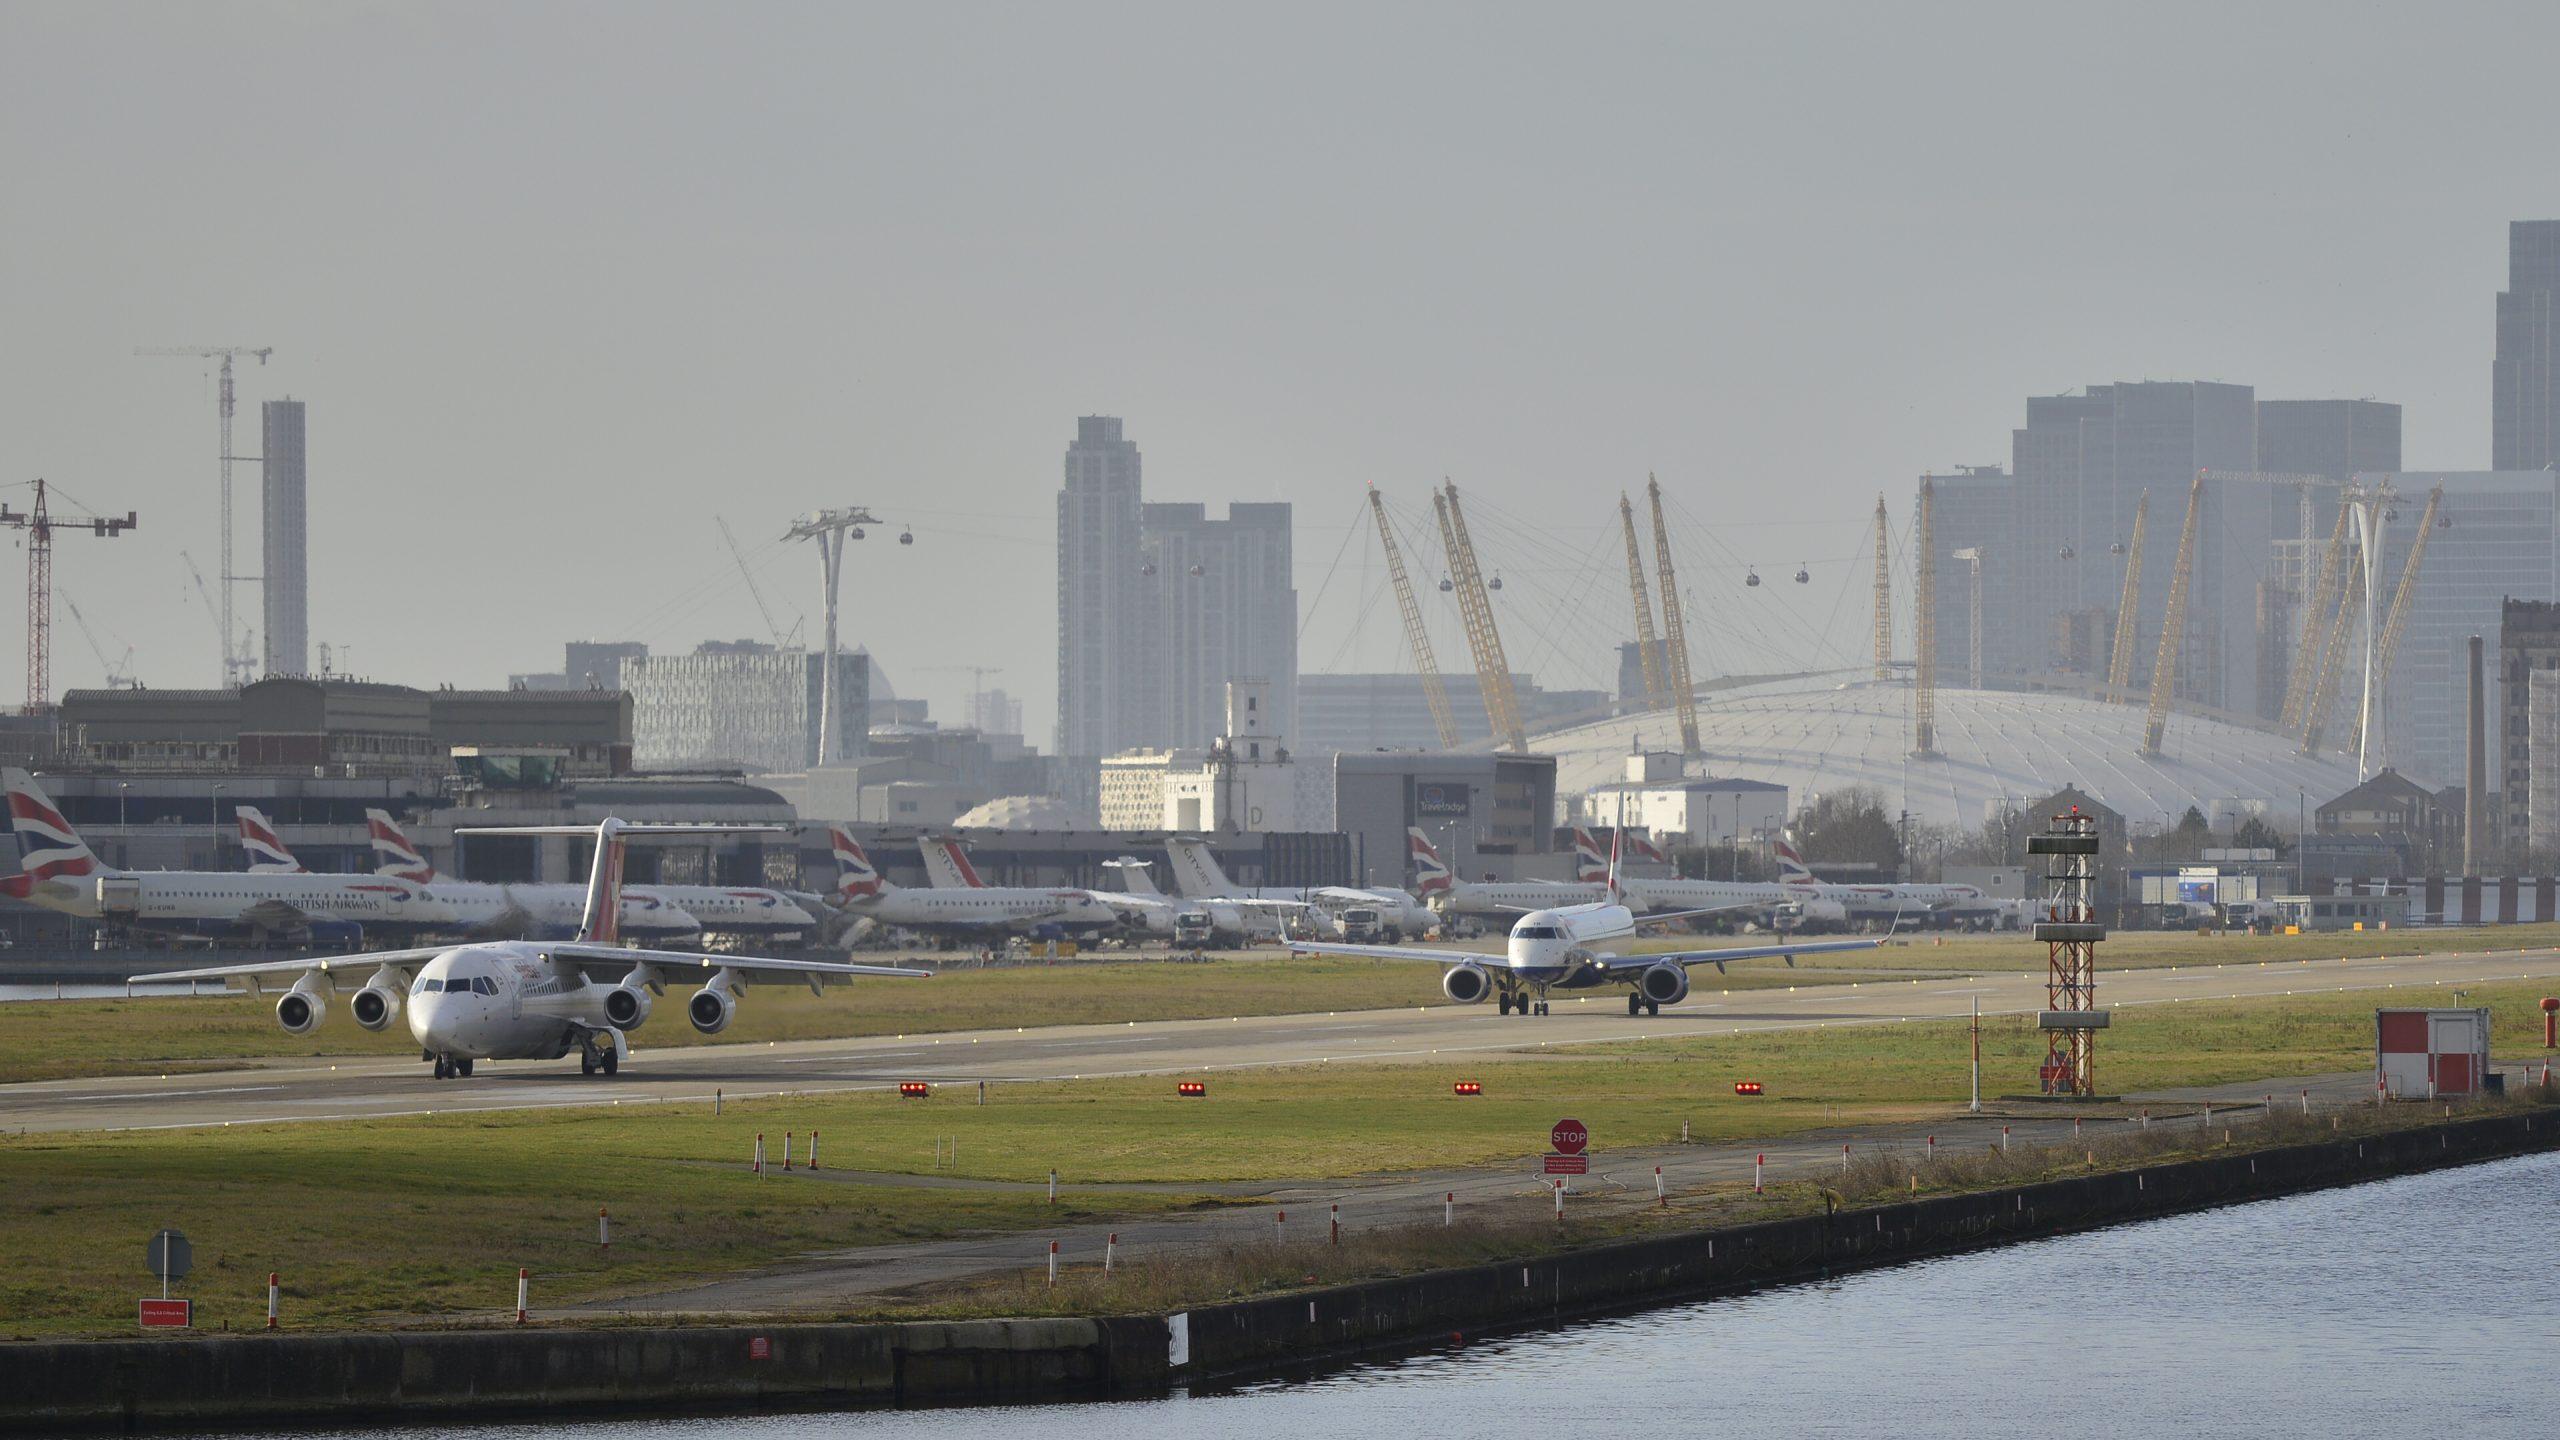 London City Airport. Foto: Aleem Yousaf, CC 2.0